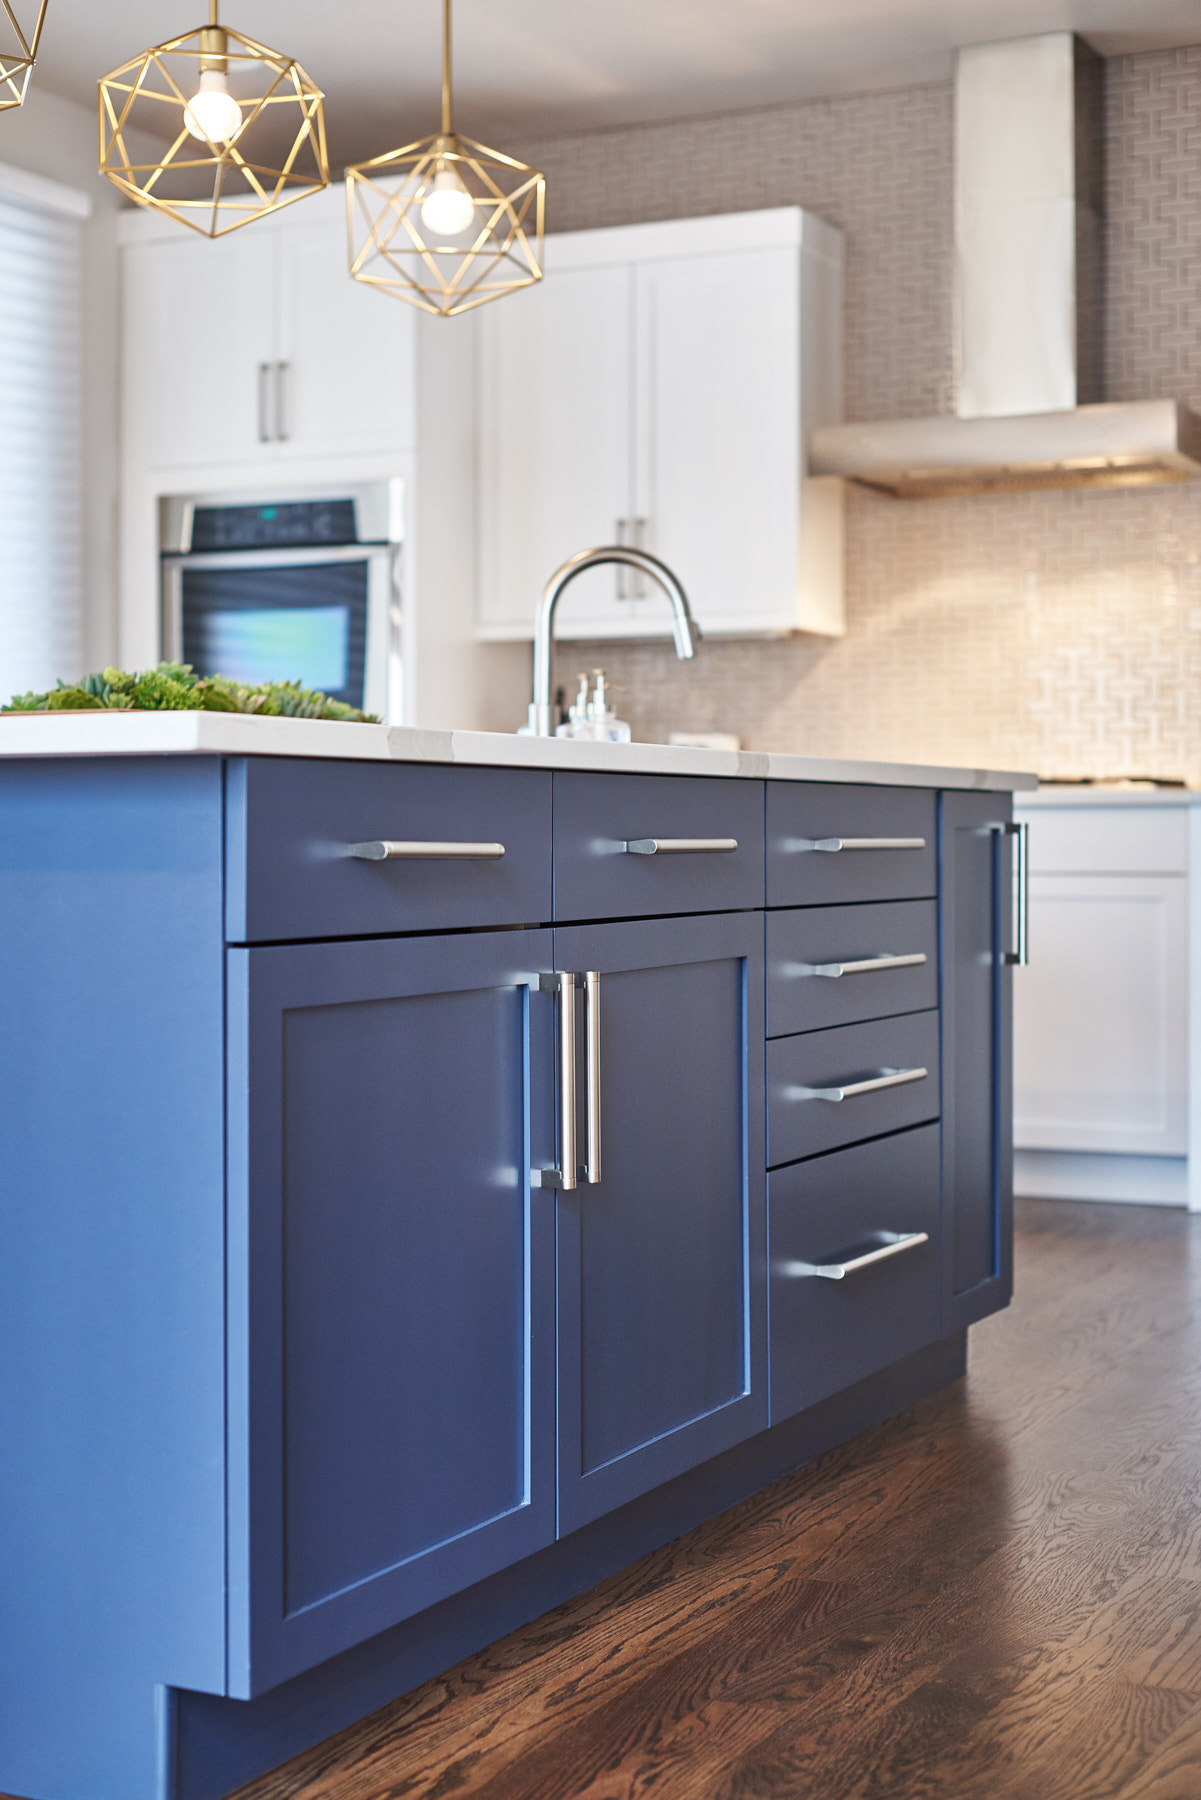 328 Design Group blue kitchen cabinet pendant lighting gold.jpg